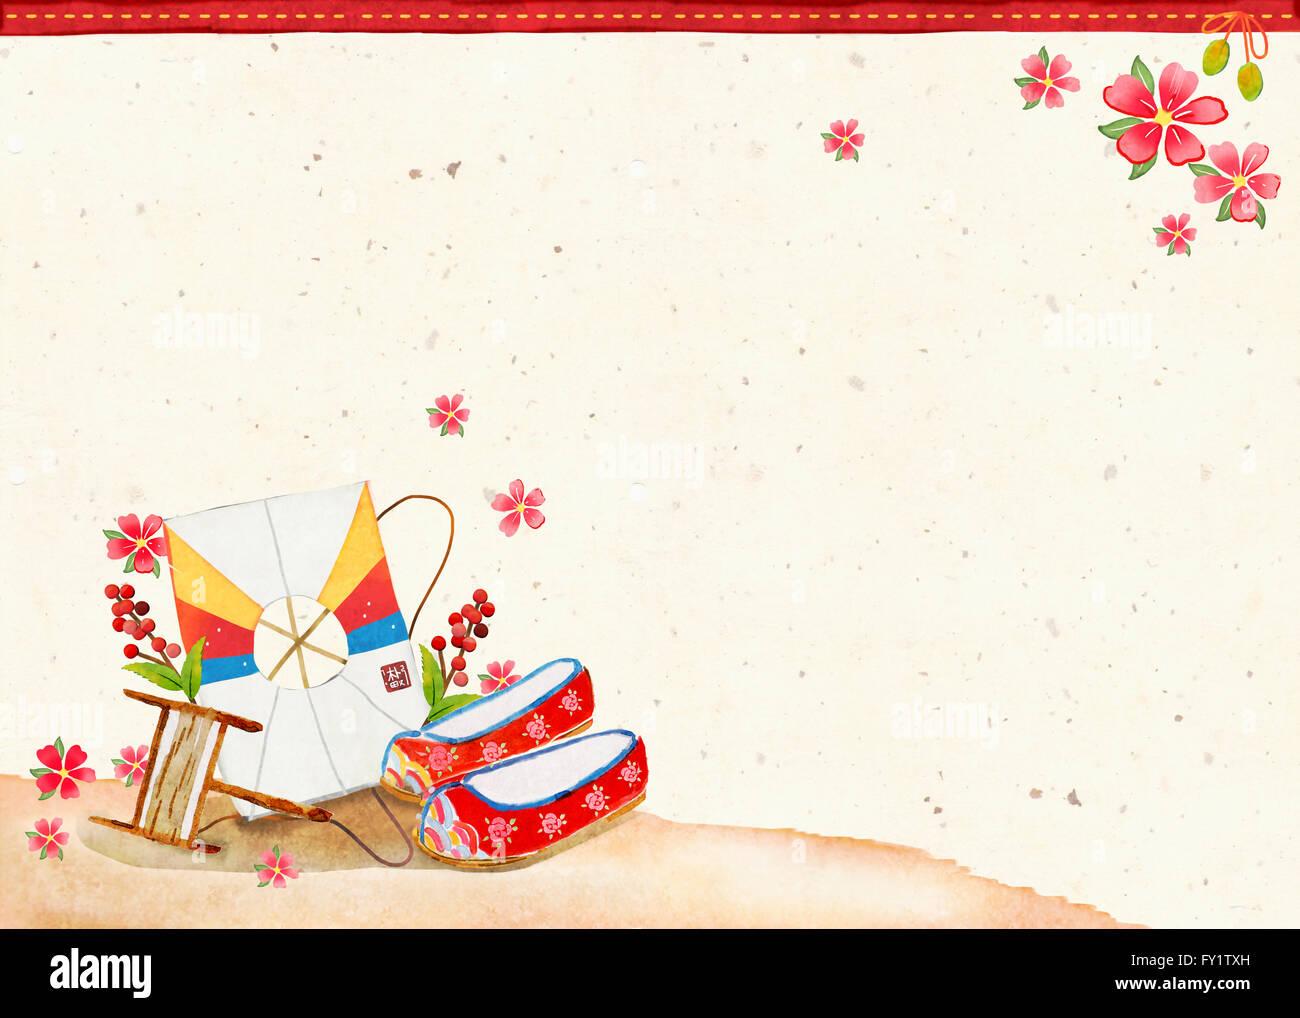 Korean new year and kite stock photos korean new year and kite new year card design in korean traditional object image stock image m4hsunfo